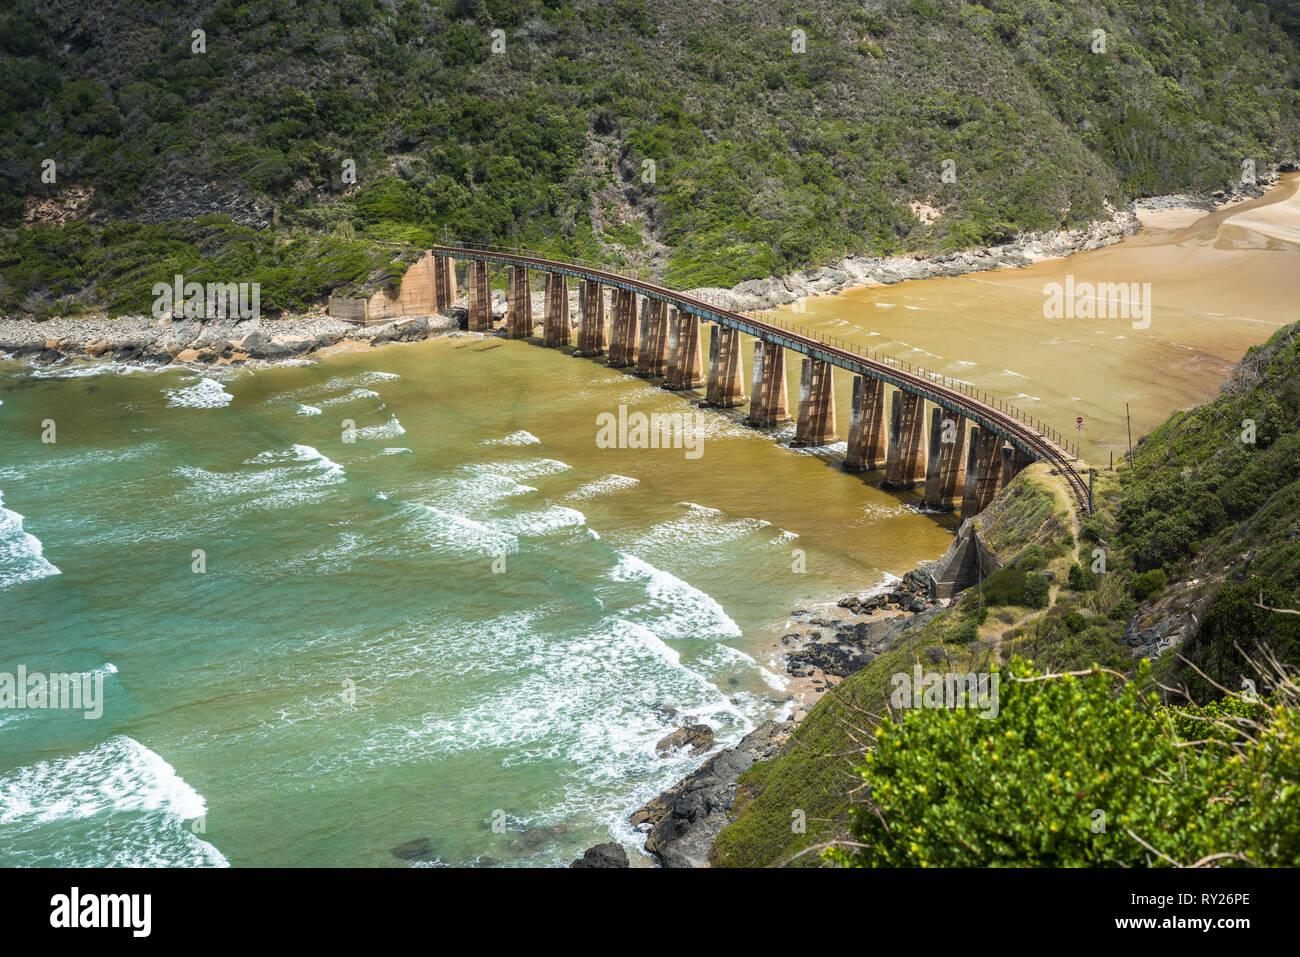 Kaaimans River Railway Bridge, Wilderness, Garden Route, South Africa Stock Photo